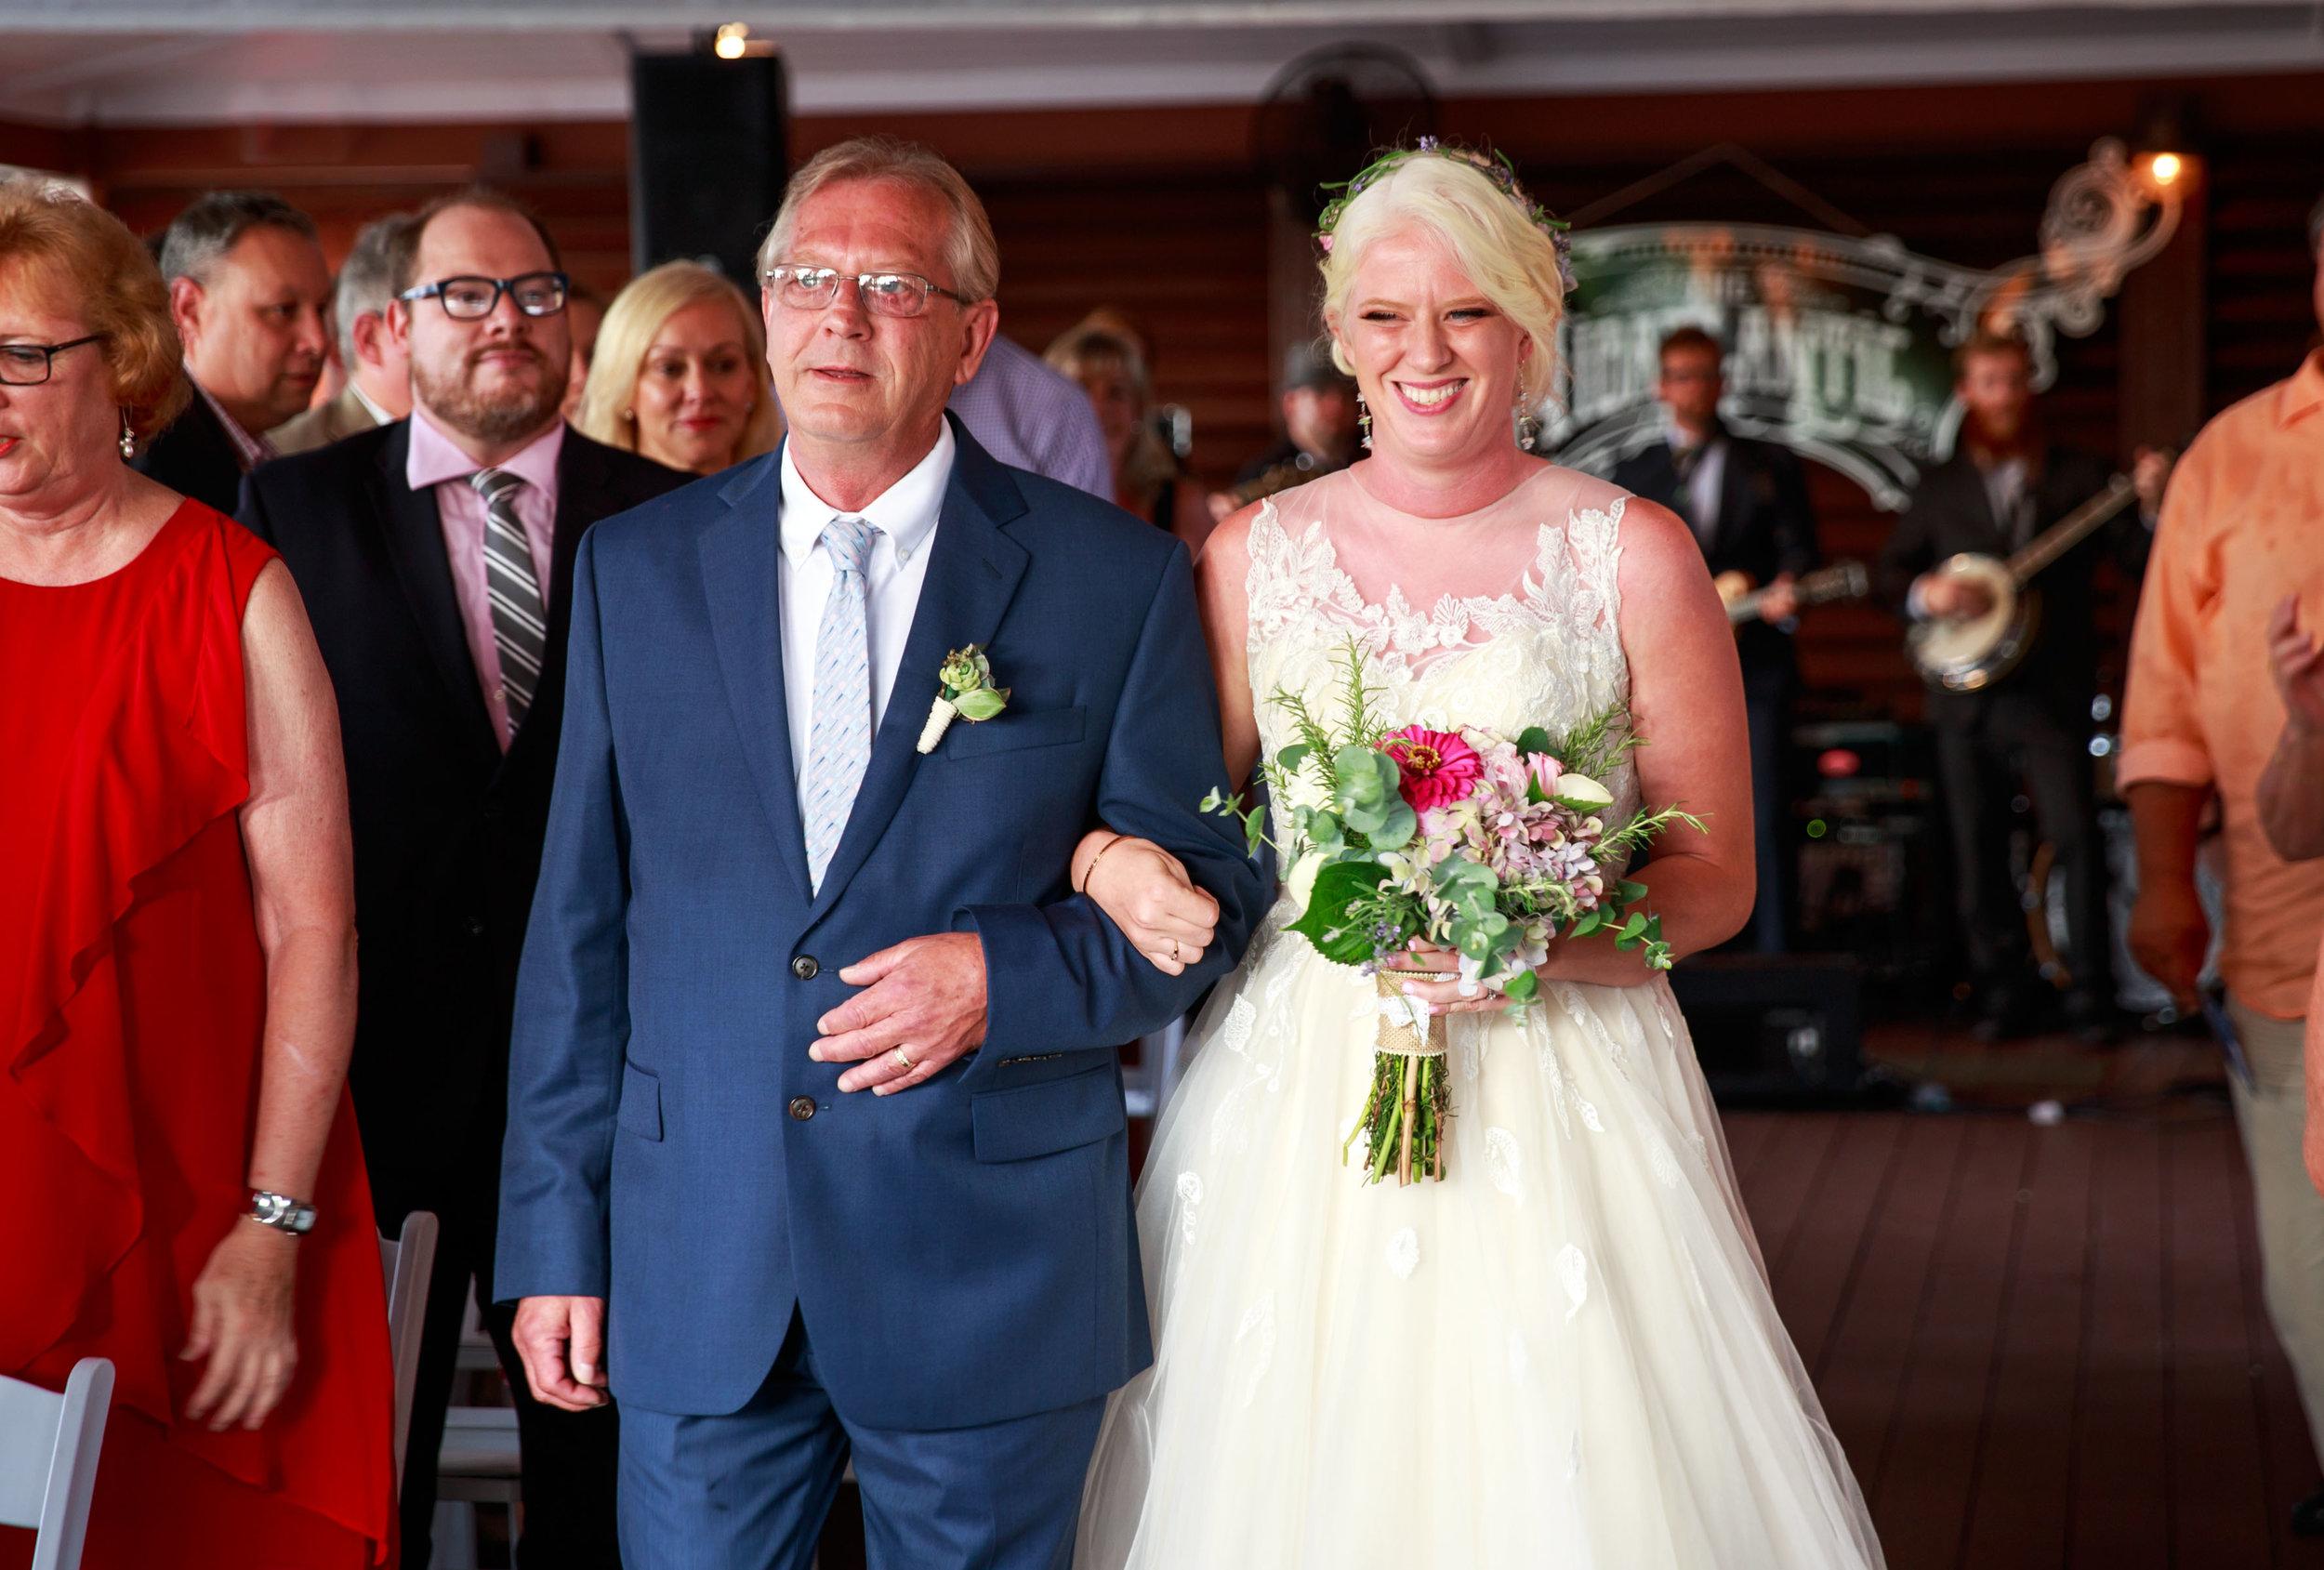 128-South-Wedding-Wilmington-NC-Photographer-Ceremony-12.jpg